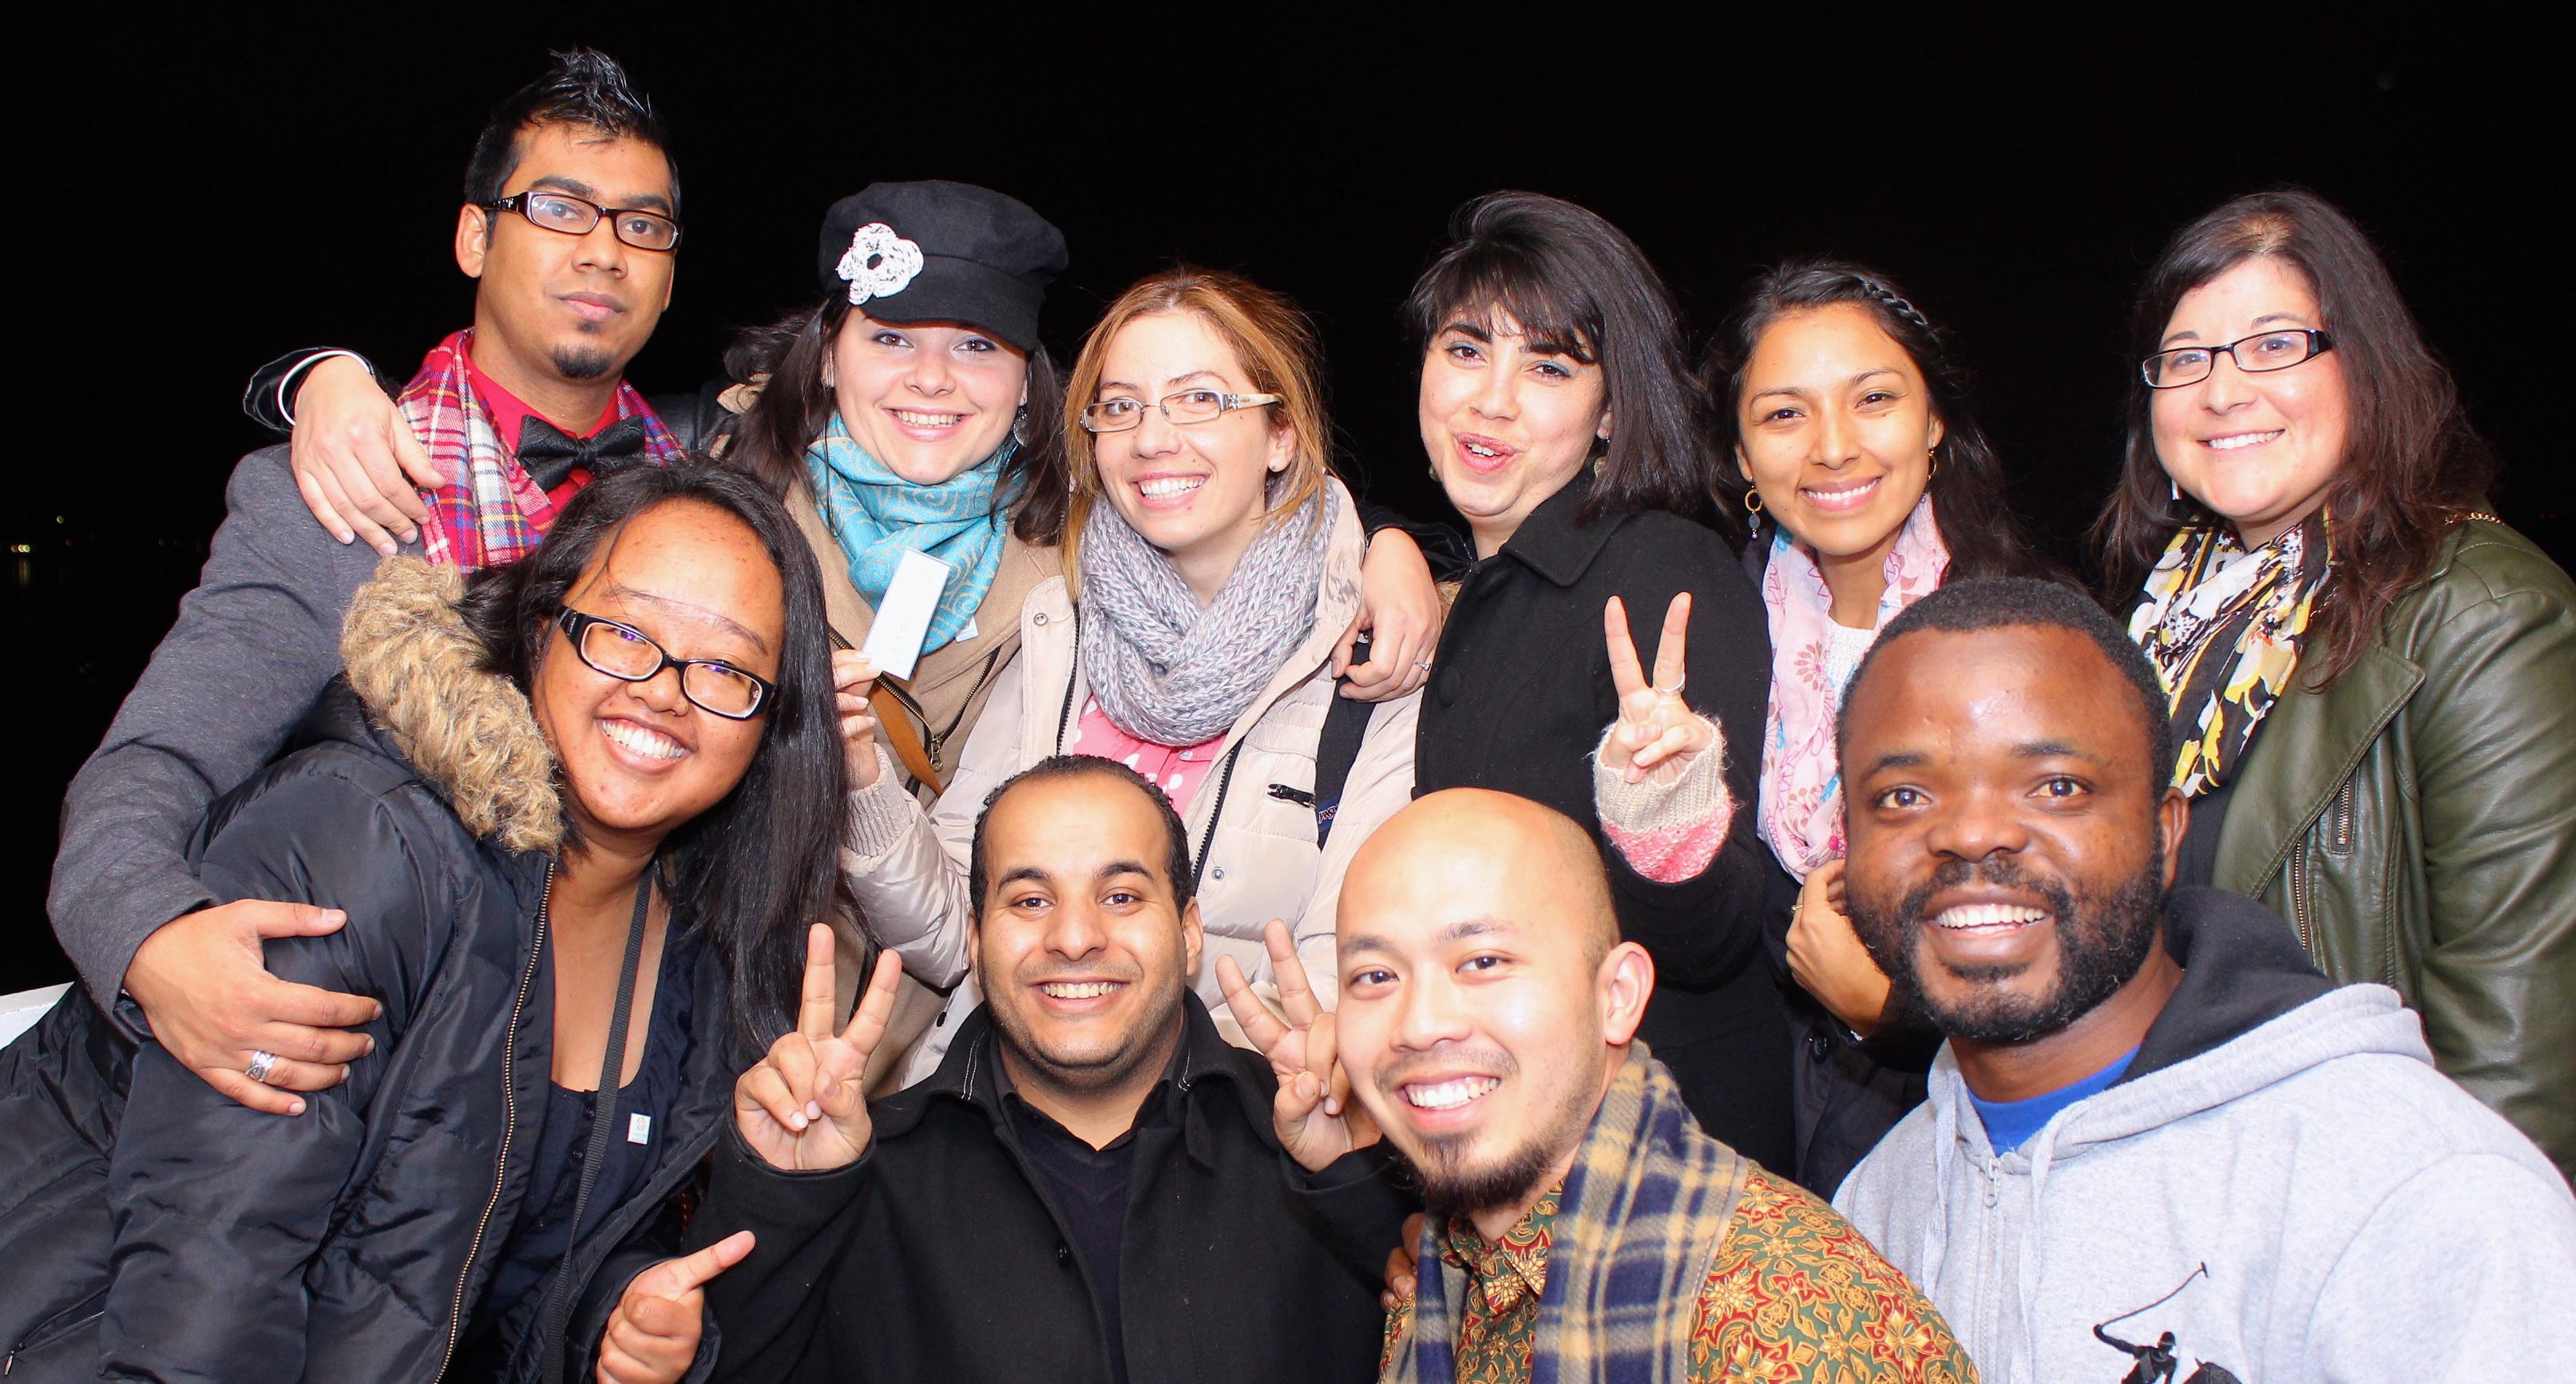 2013 Community Solutions Fellows (Abdillah Zamzuri, last row second from right)